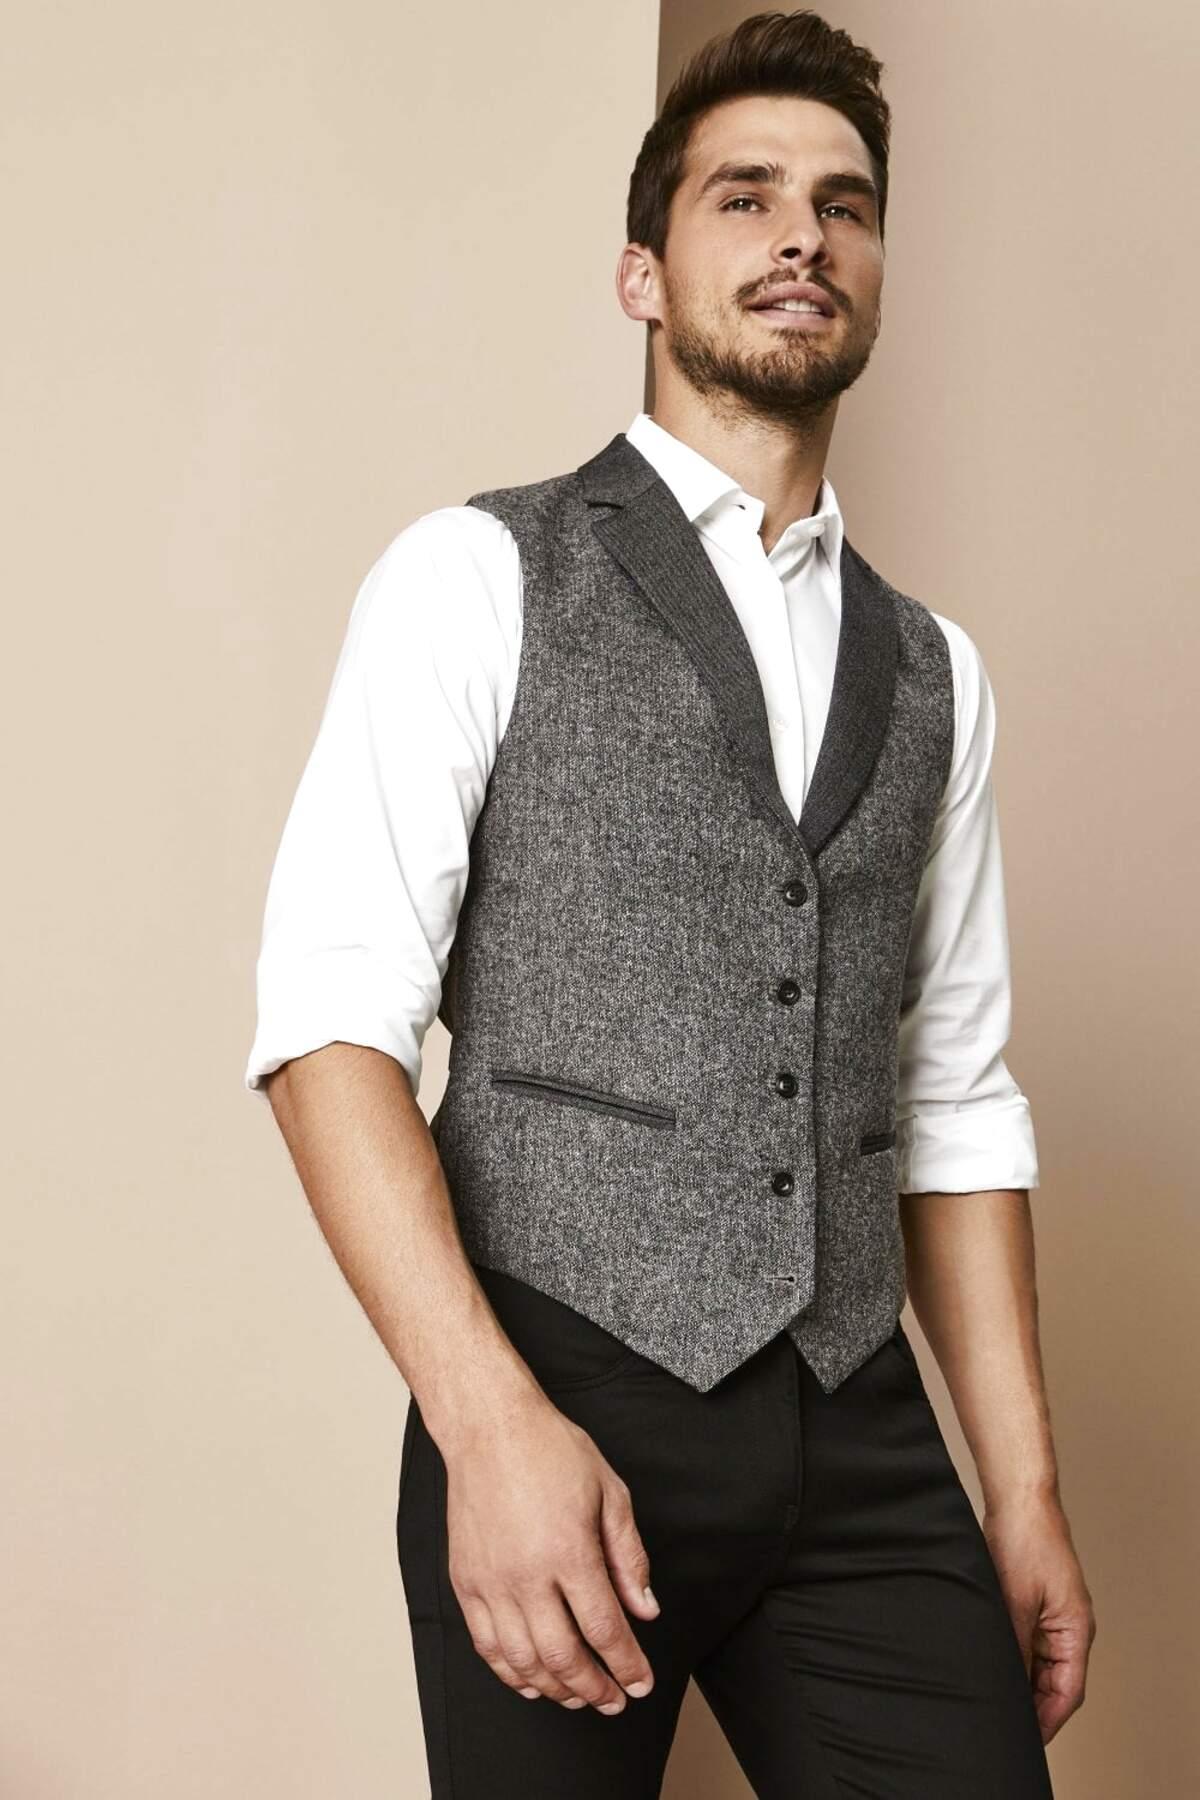 tweed waistcoat for sale